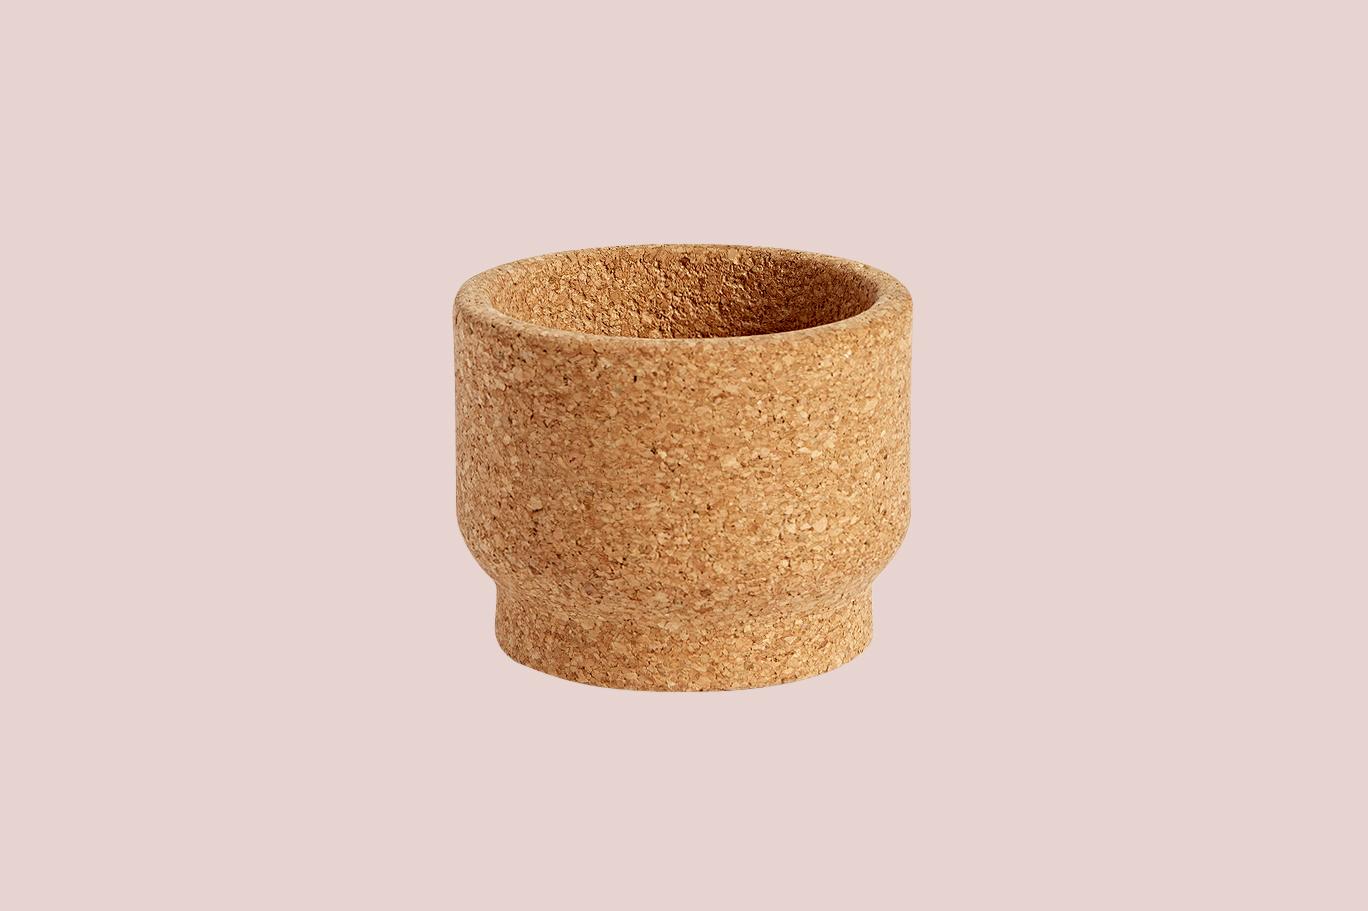 Rejuvenation Modern Cork Planter